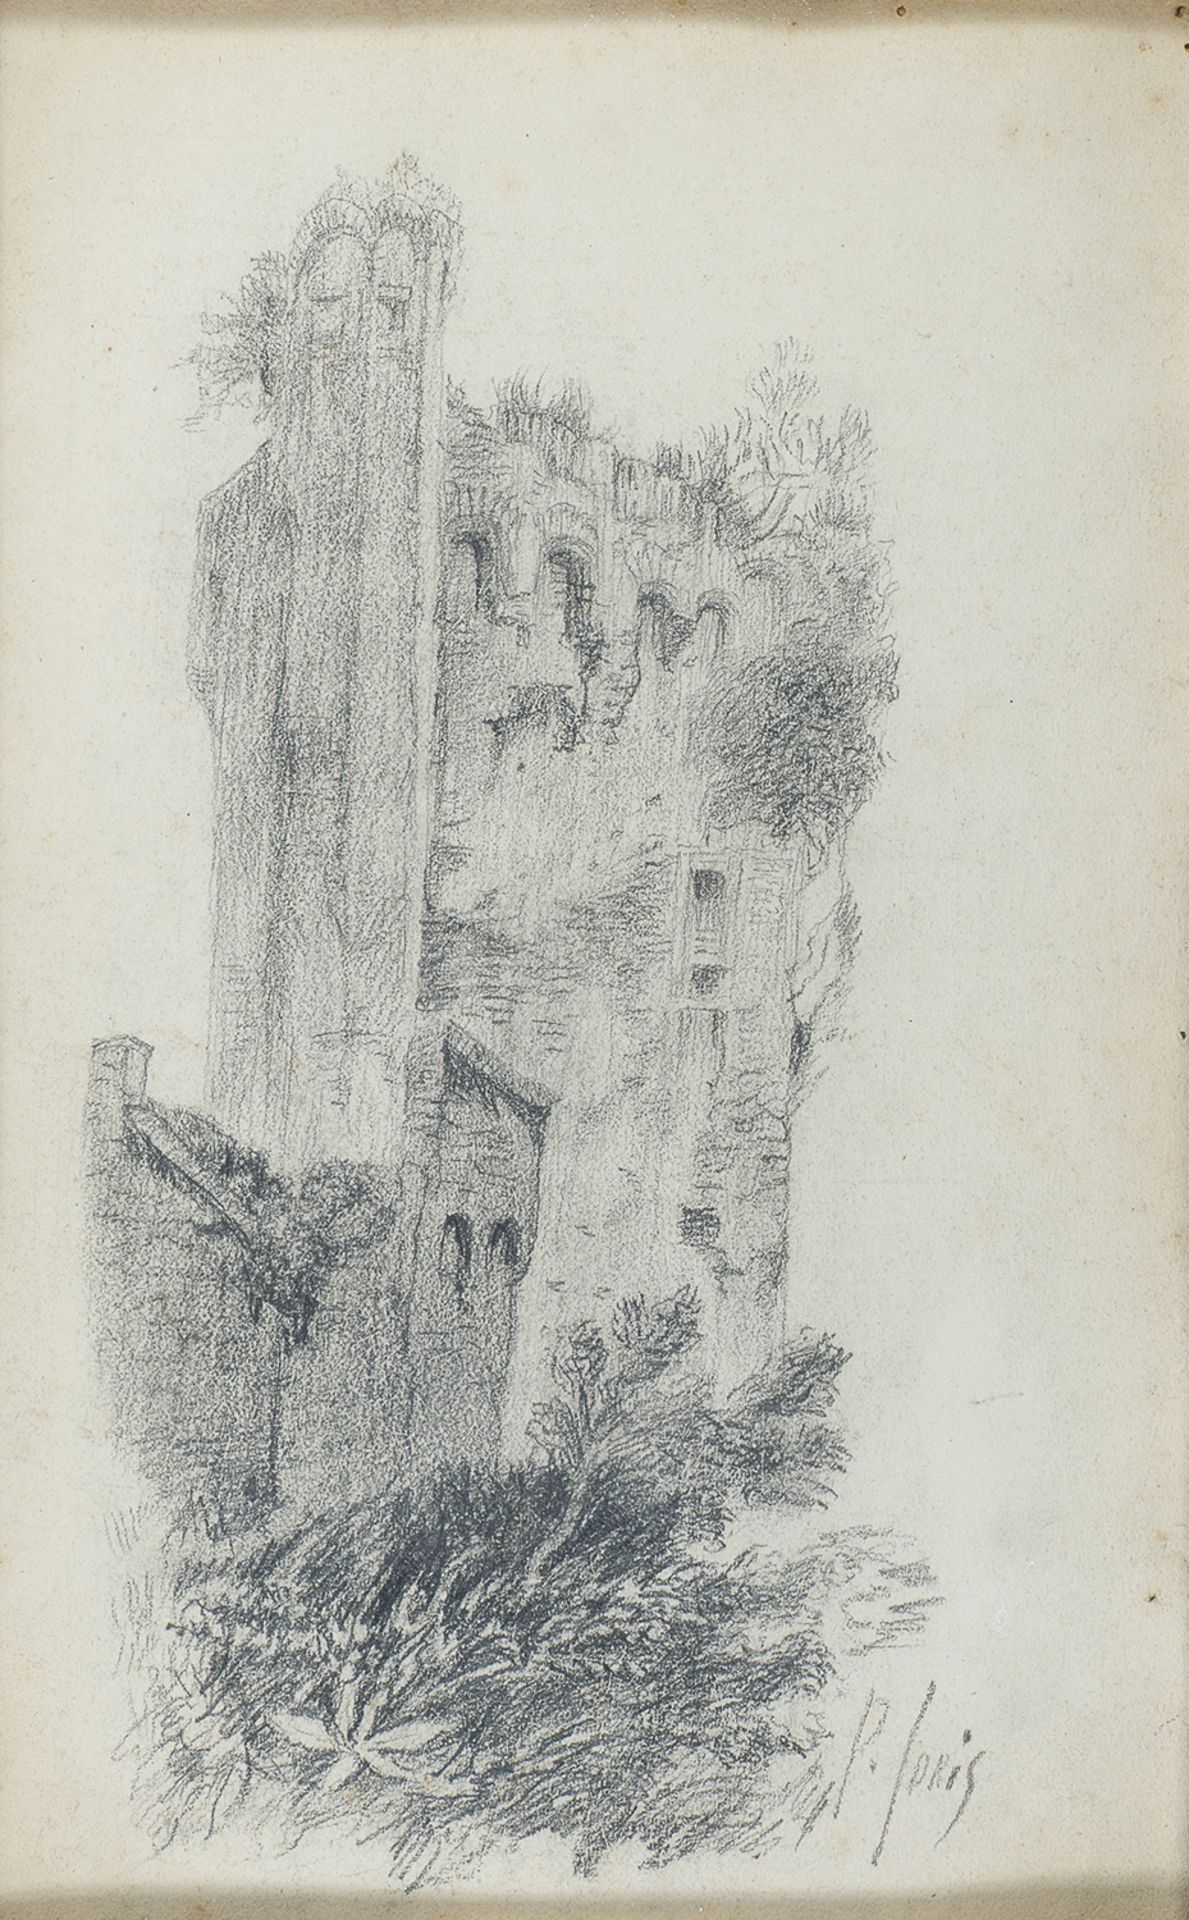 PENCIL DRAWING OF RUINS BY PIO JORIS (1843-1921)